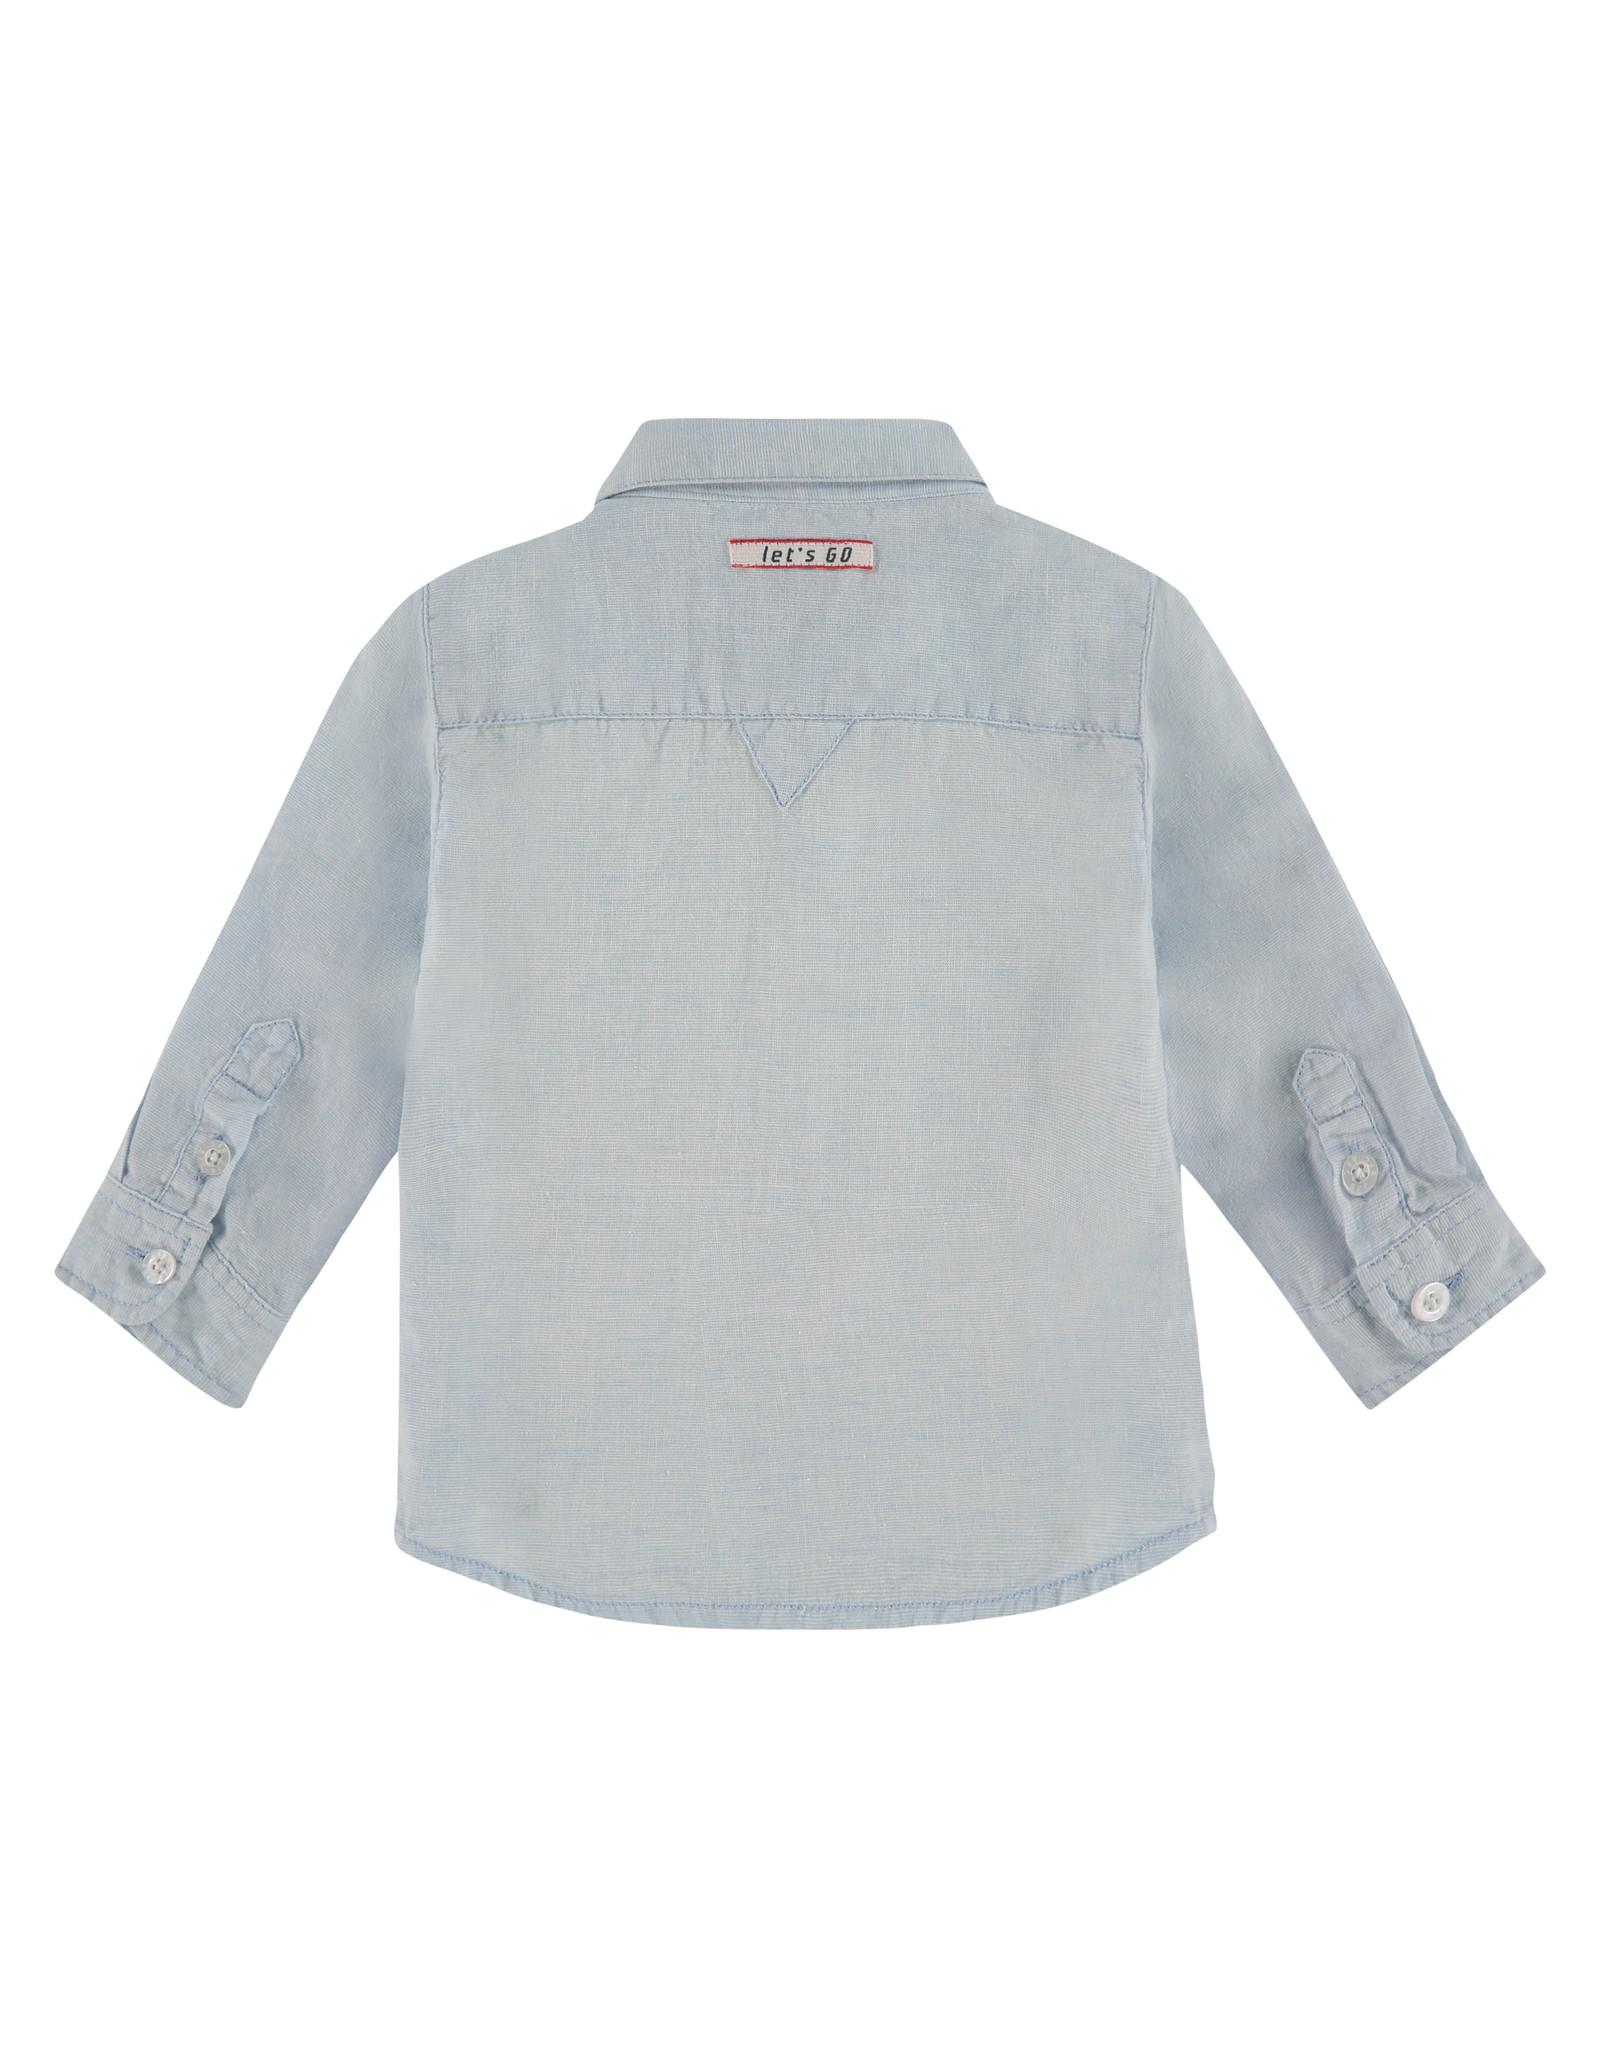 Babyface boys shirt, light blue, BBE21107521